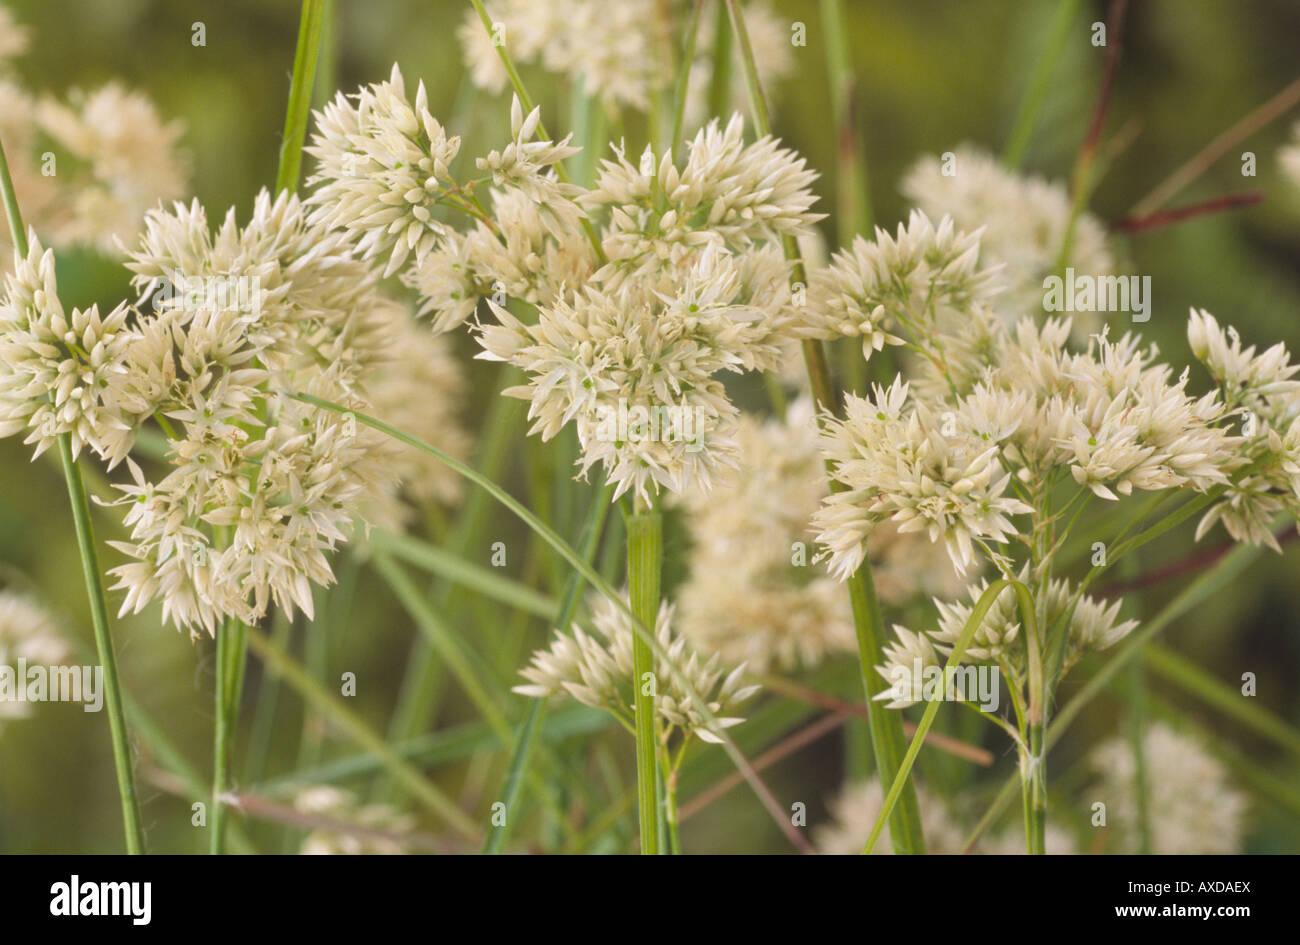 Luzula nivea (Snowy woodrush) - Stock Image